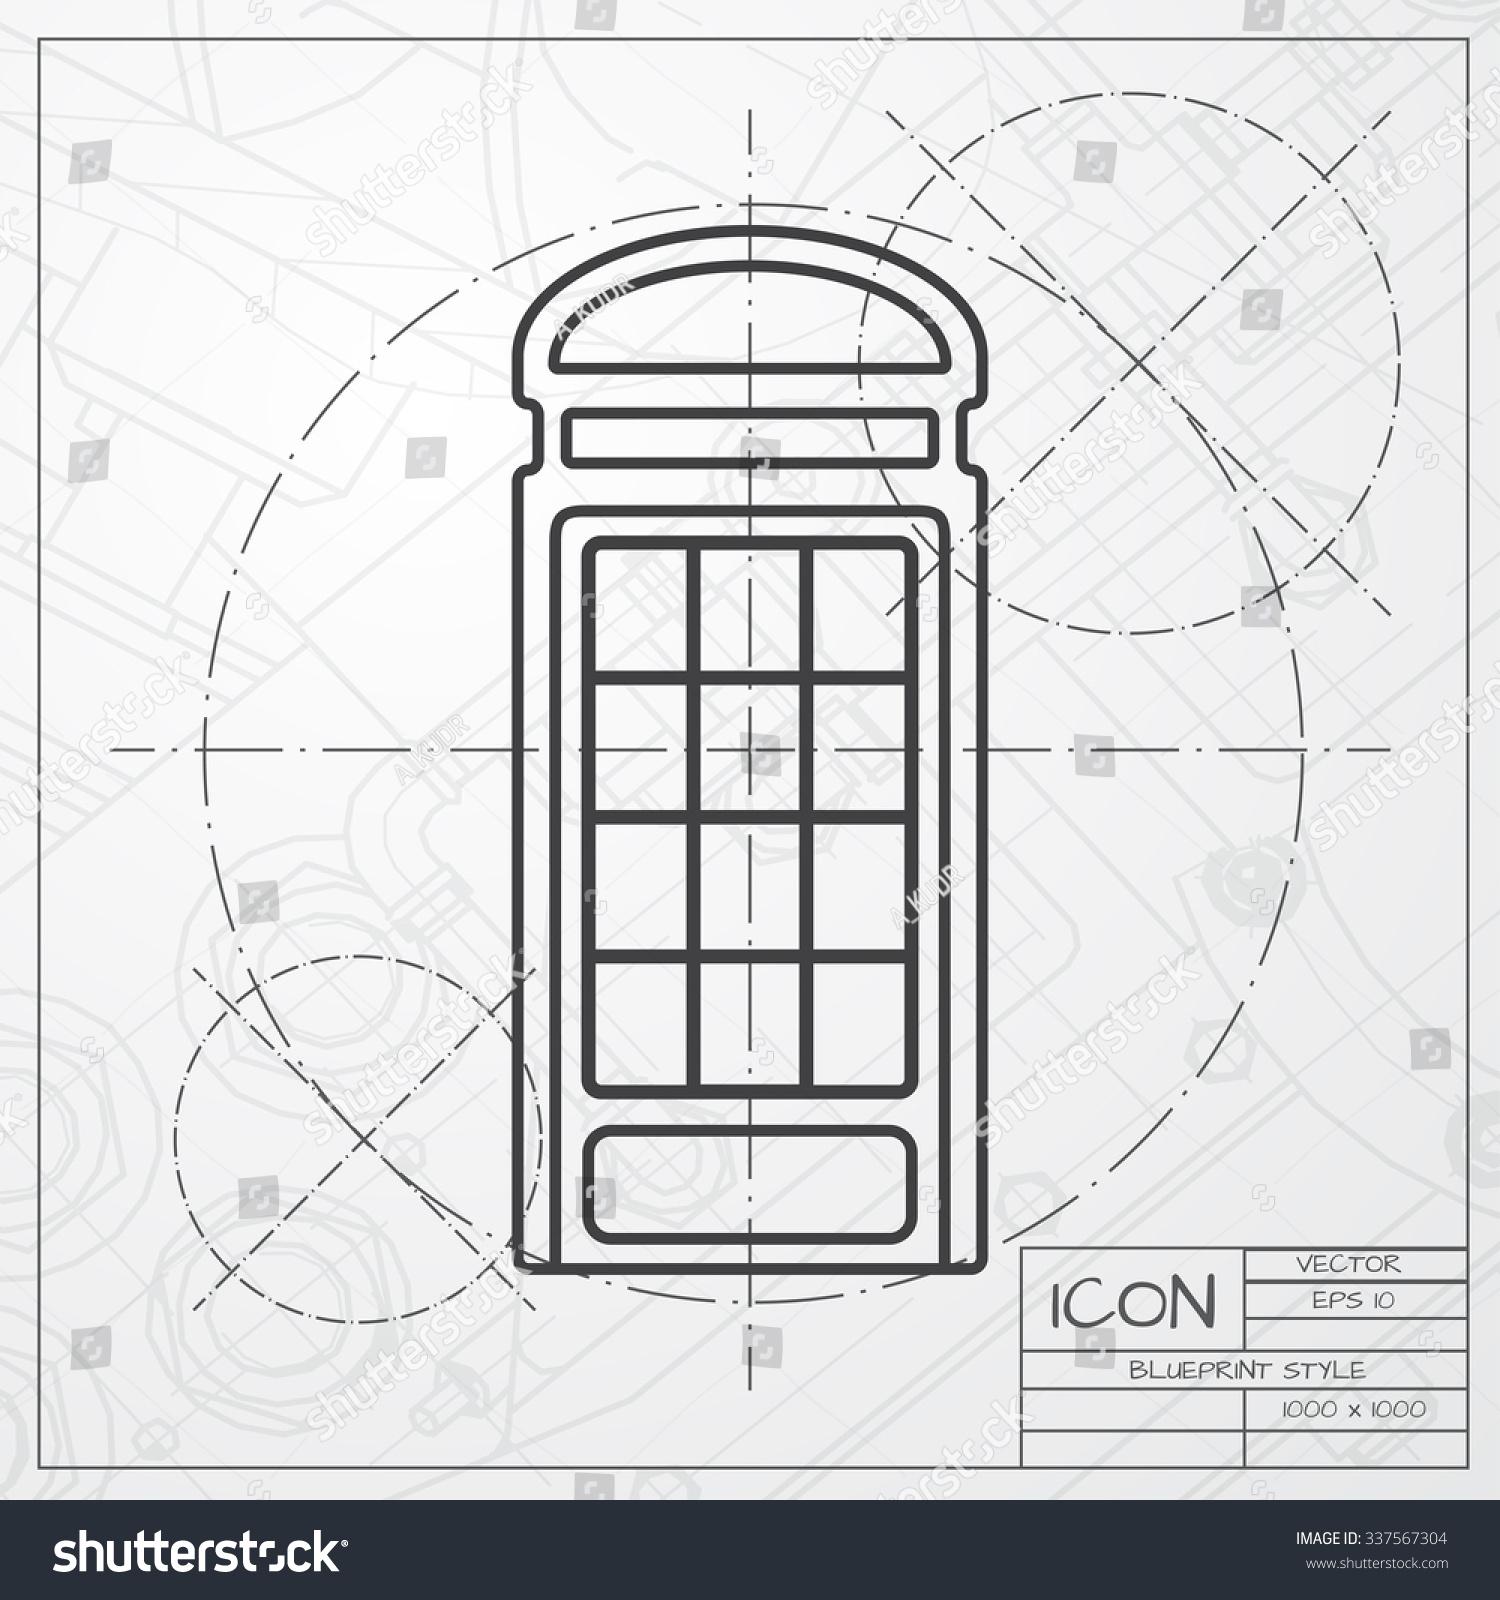 Vector blueprint telephone box icon on stock vector 337567304 vector blueprint of telephone box icon on engineer or architect background malvernweather Images